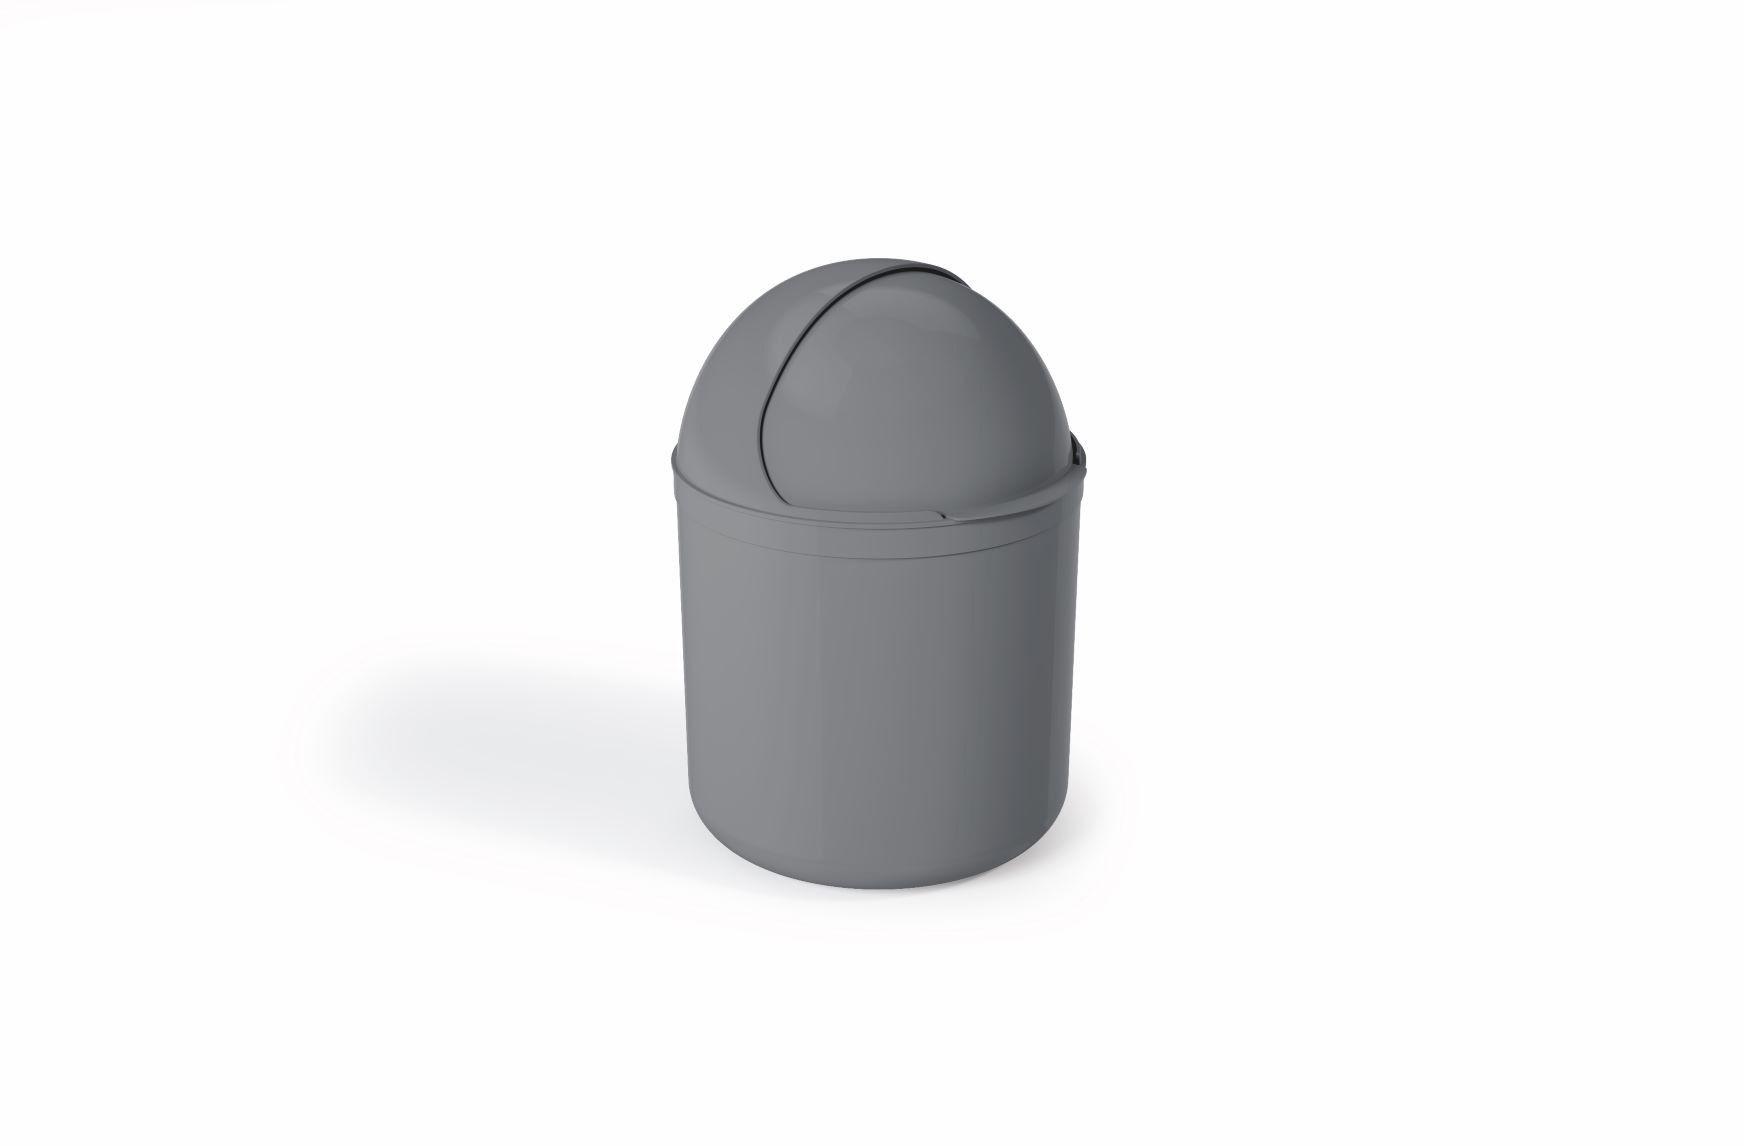 Lixeira Para Pia Plástico 4 Litros - UZ  Cinza